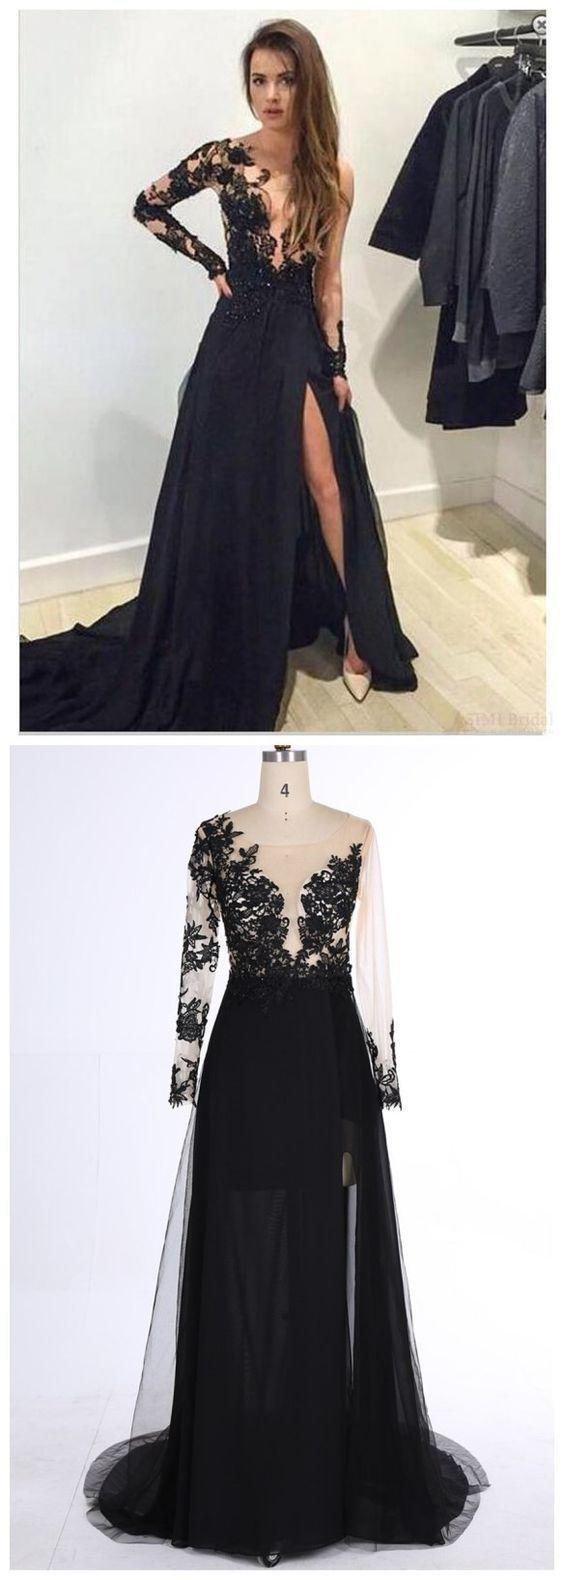 Long sleeveless lace prom dressesmermaid prom dressesblack vneck